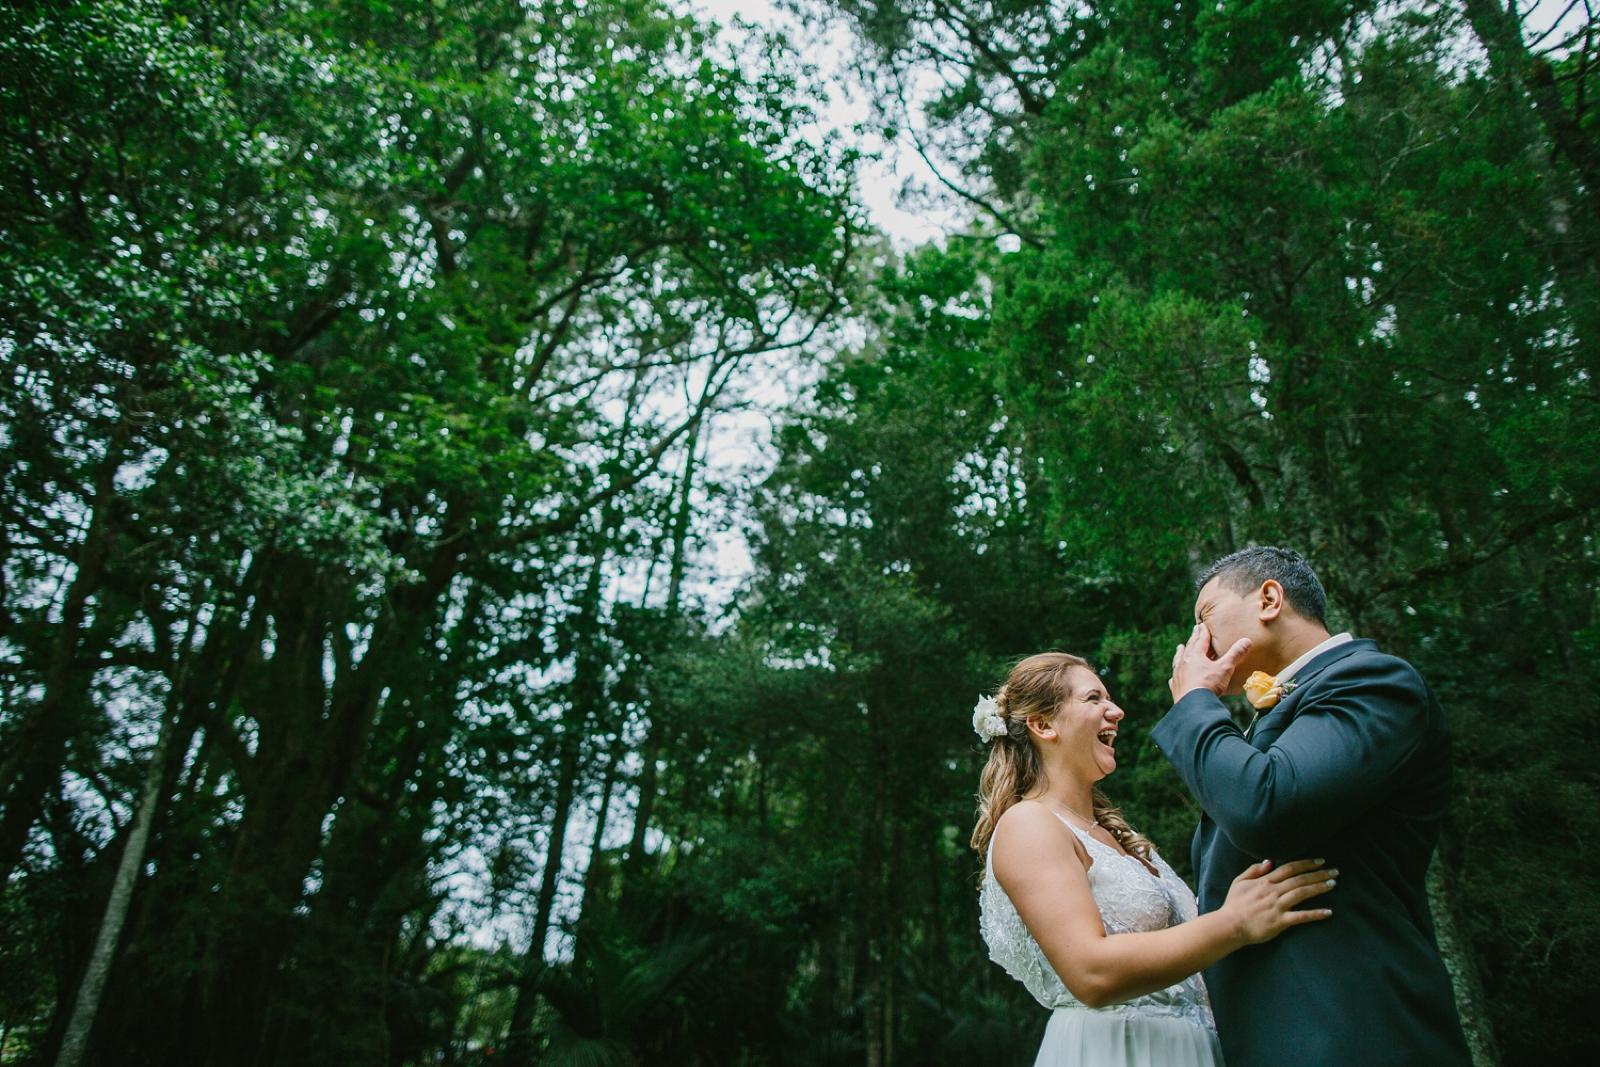 GabbyFiti_Auckland Wedding Photographer_Patty Lagera_0082.jpg